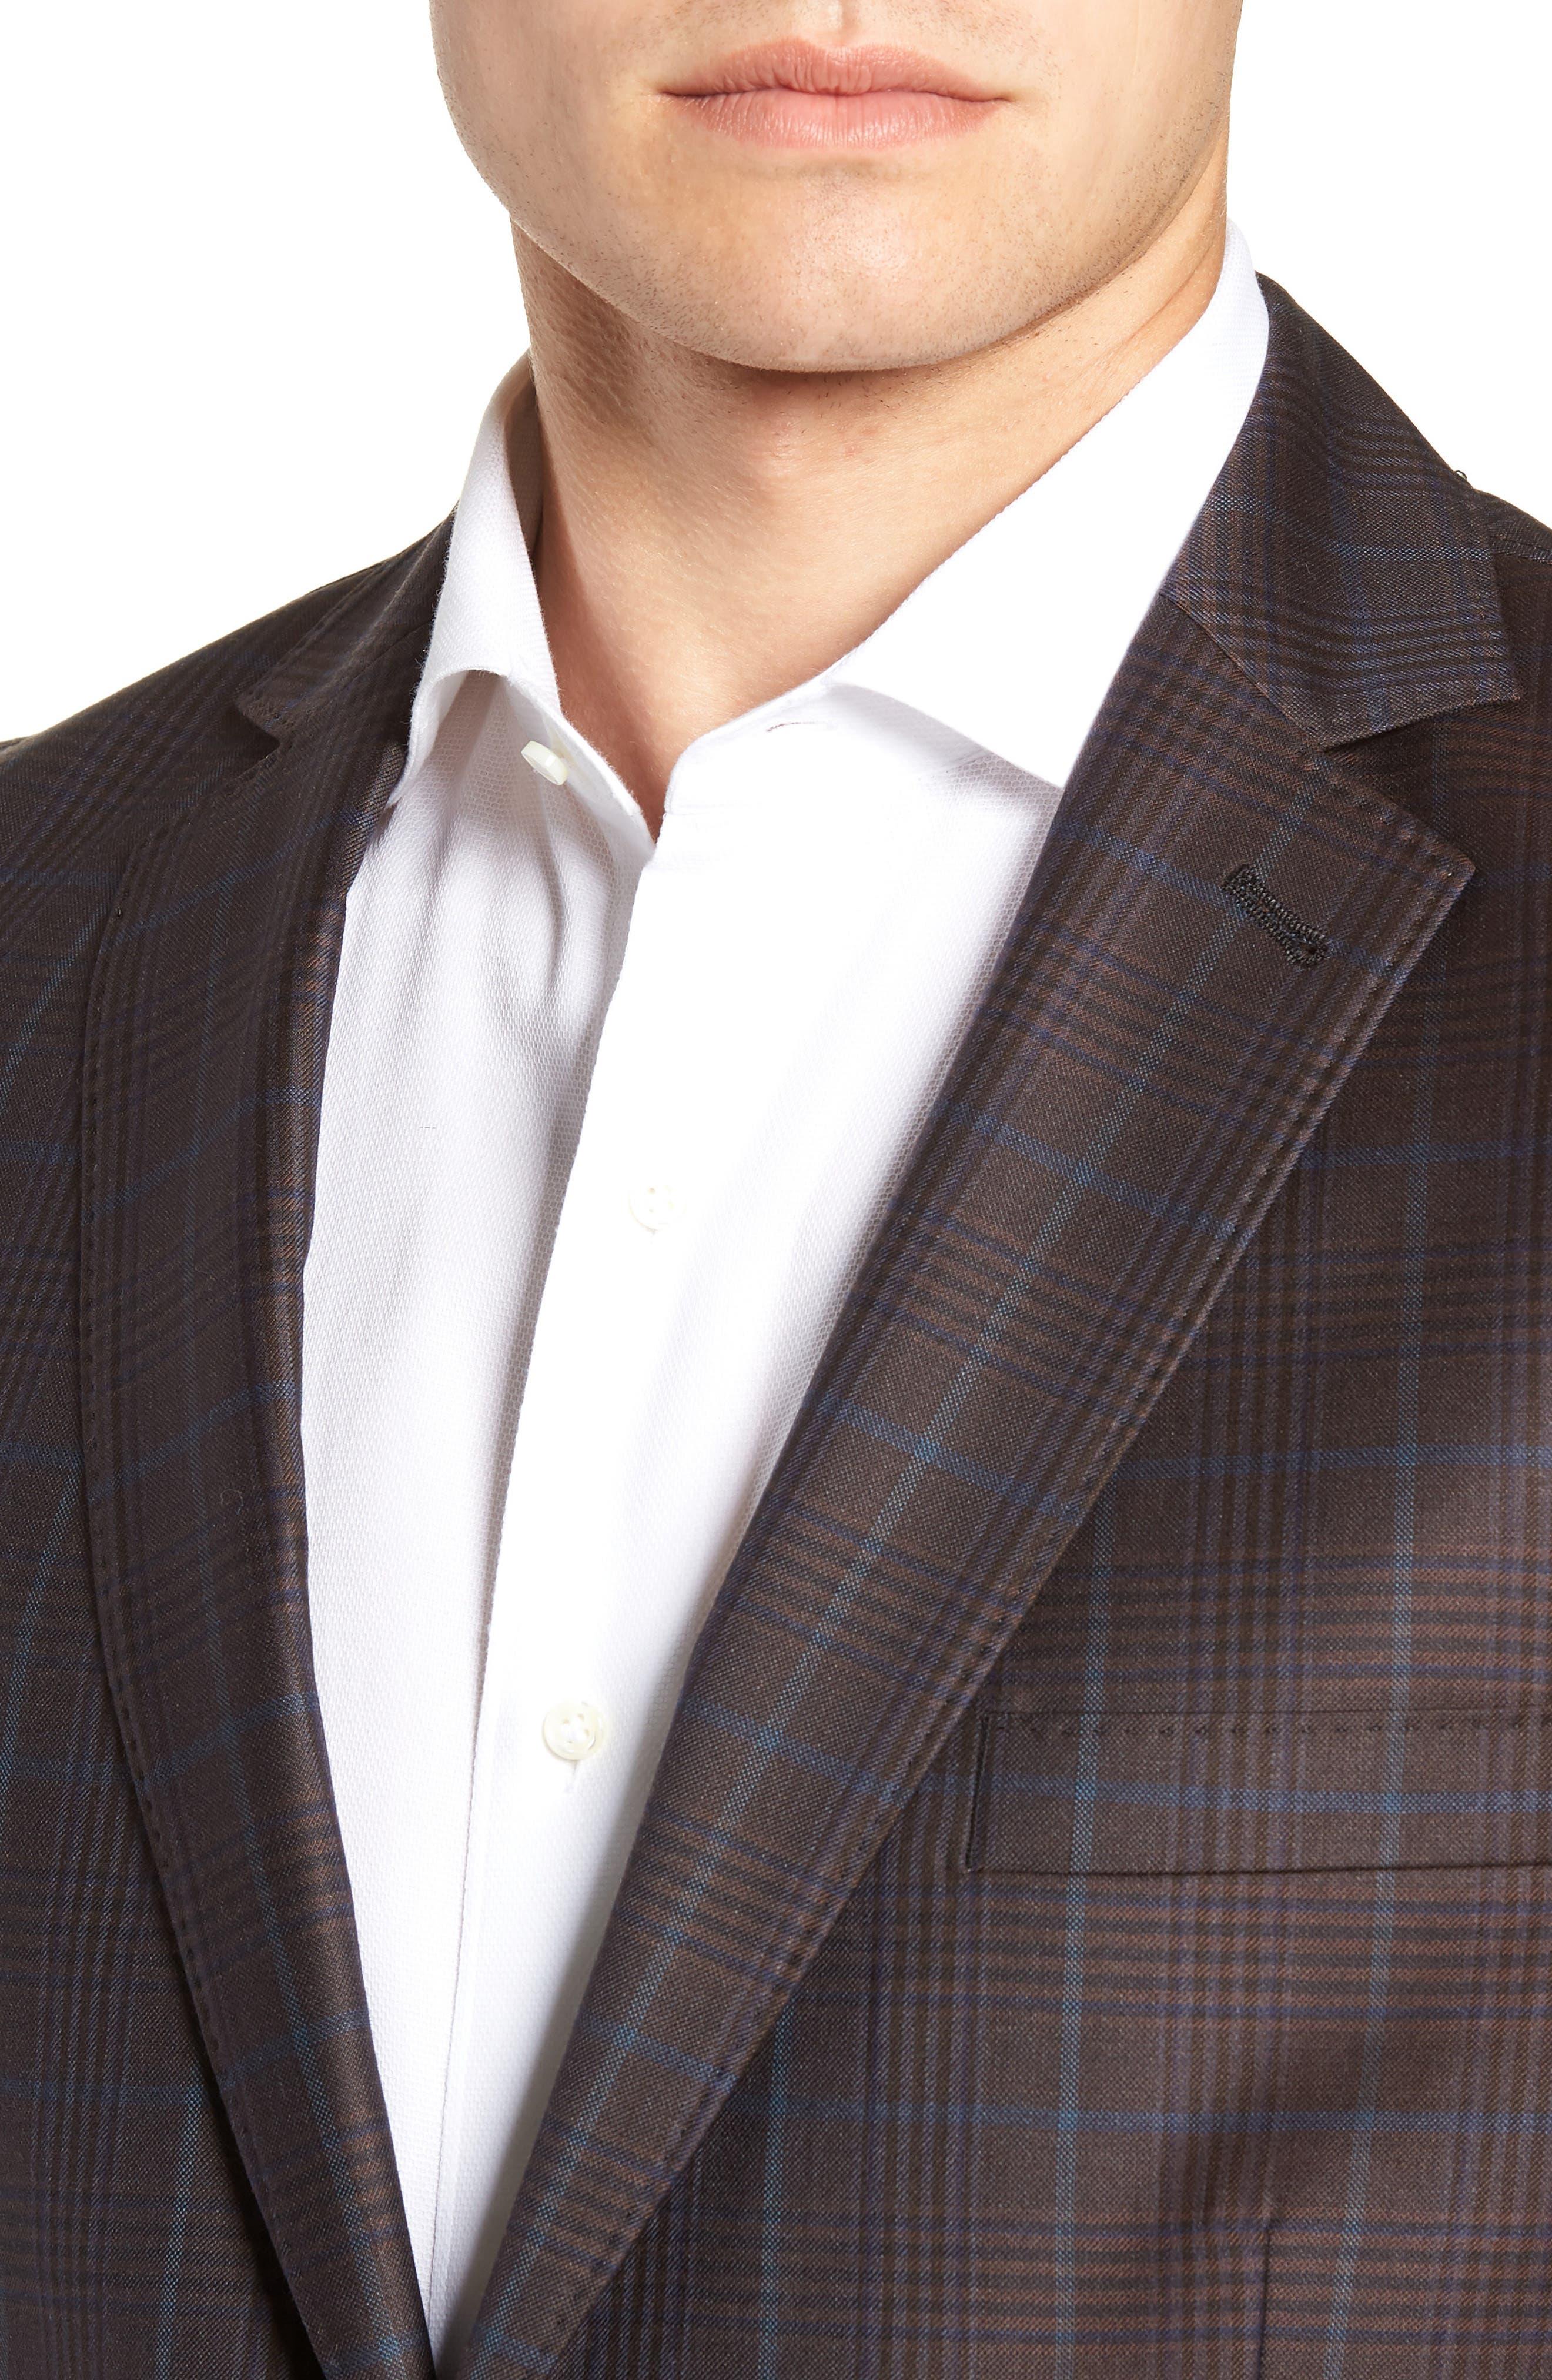 Regular Fit Super 130's Wool Blazer,                             Alternate thumbnail 4, color,                             BROWN